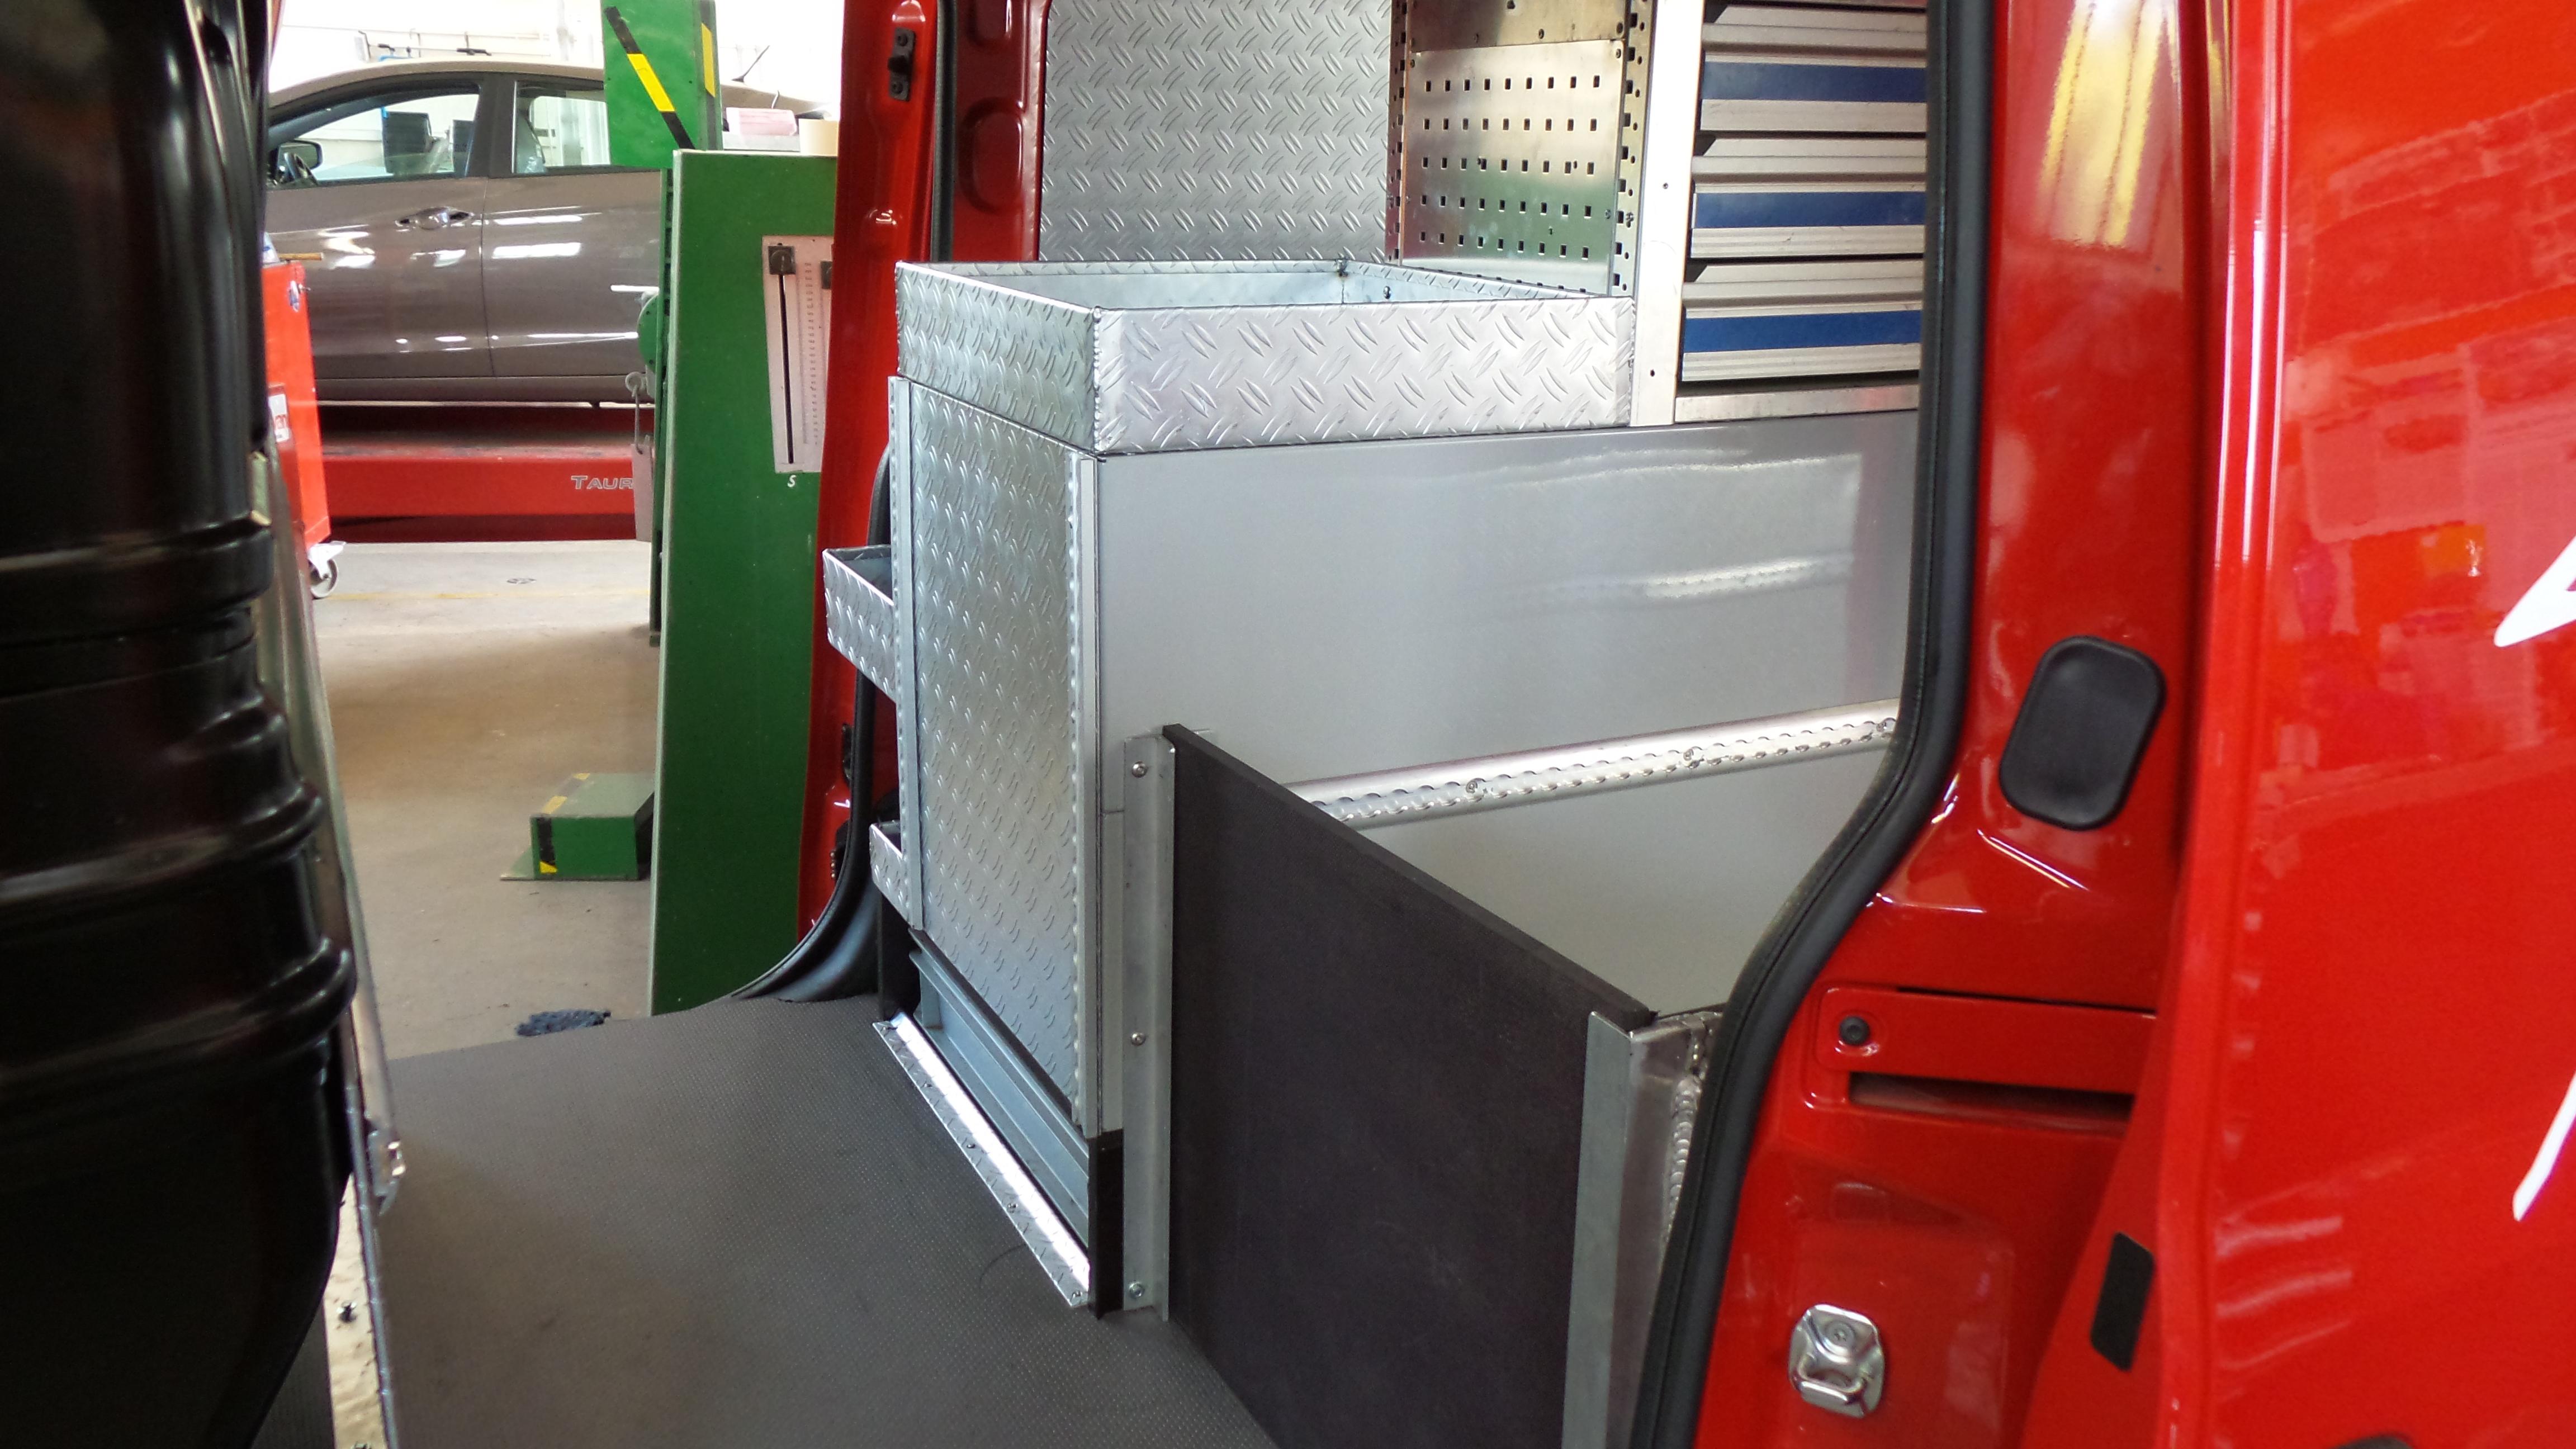 Carrosserie_Sauter_Fahrzeugbau_ Innenausbauten_018